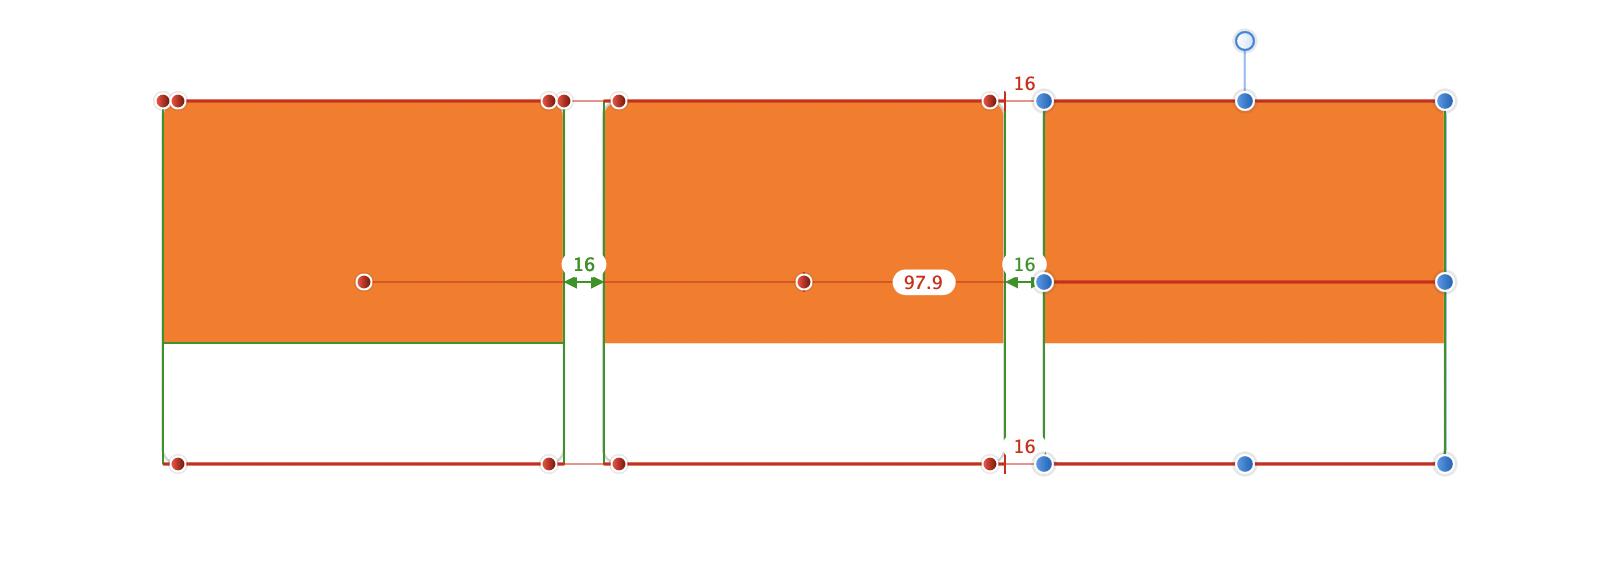 Affinity Designerで3つの長方形のオブジェクトに関する動的ガイドが表示さている状態